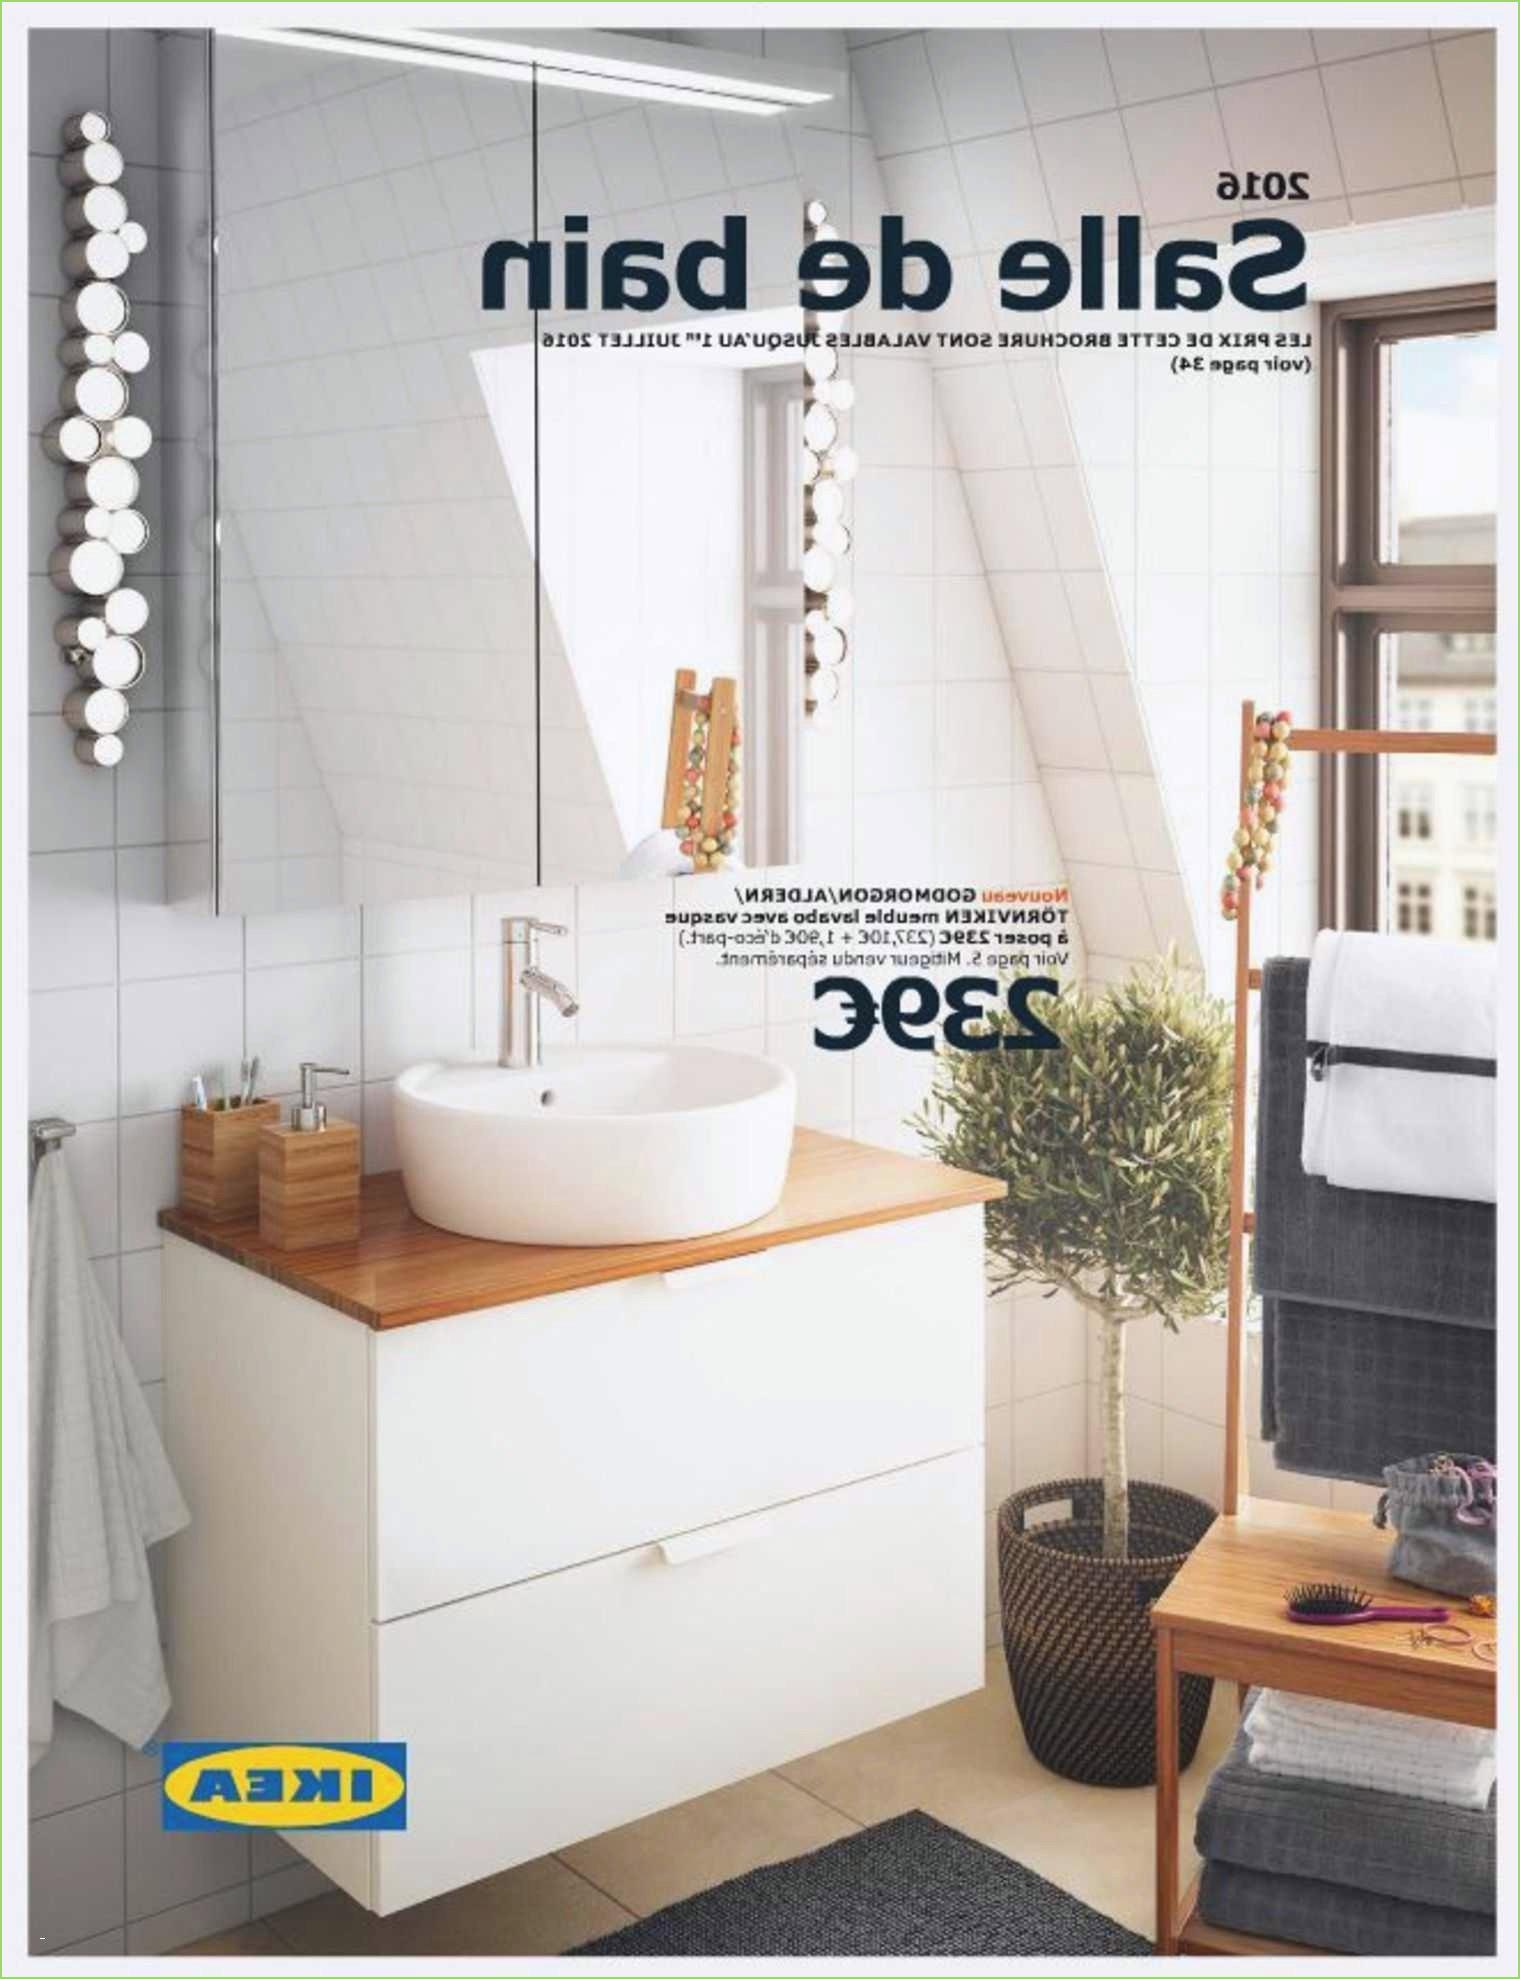 Mitigeur Salle De Bain Ikea Inspirant Photographie Mitigeur Salle De Bain Ikea Inspirant Beau Ikea Robinet Salle De